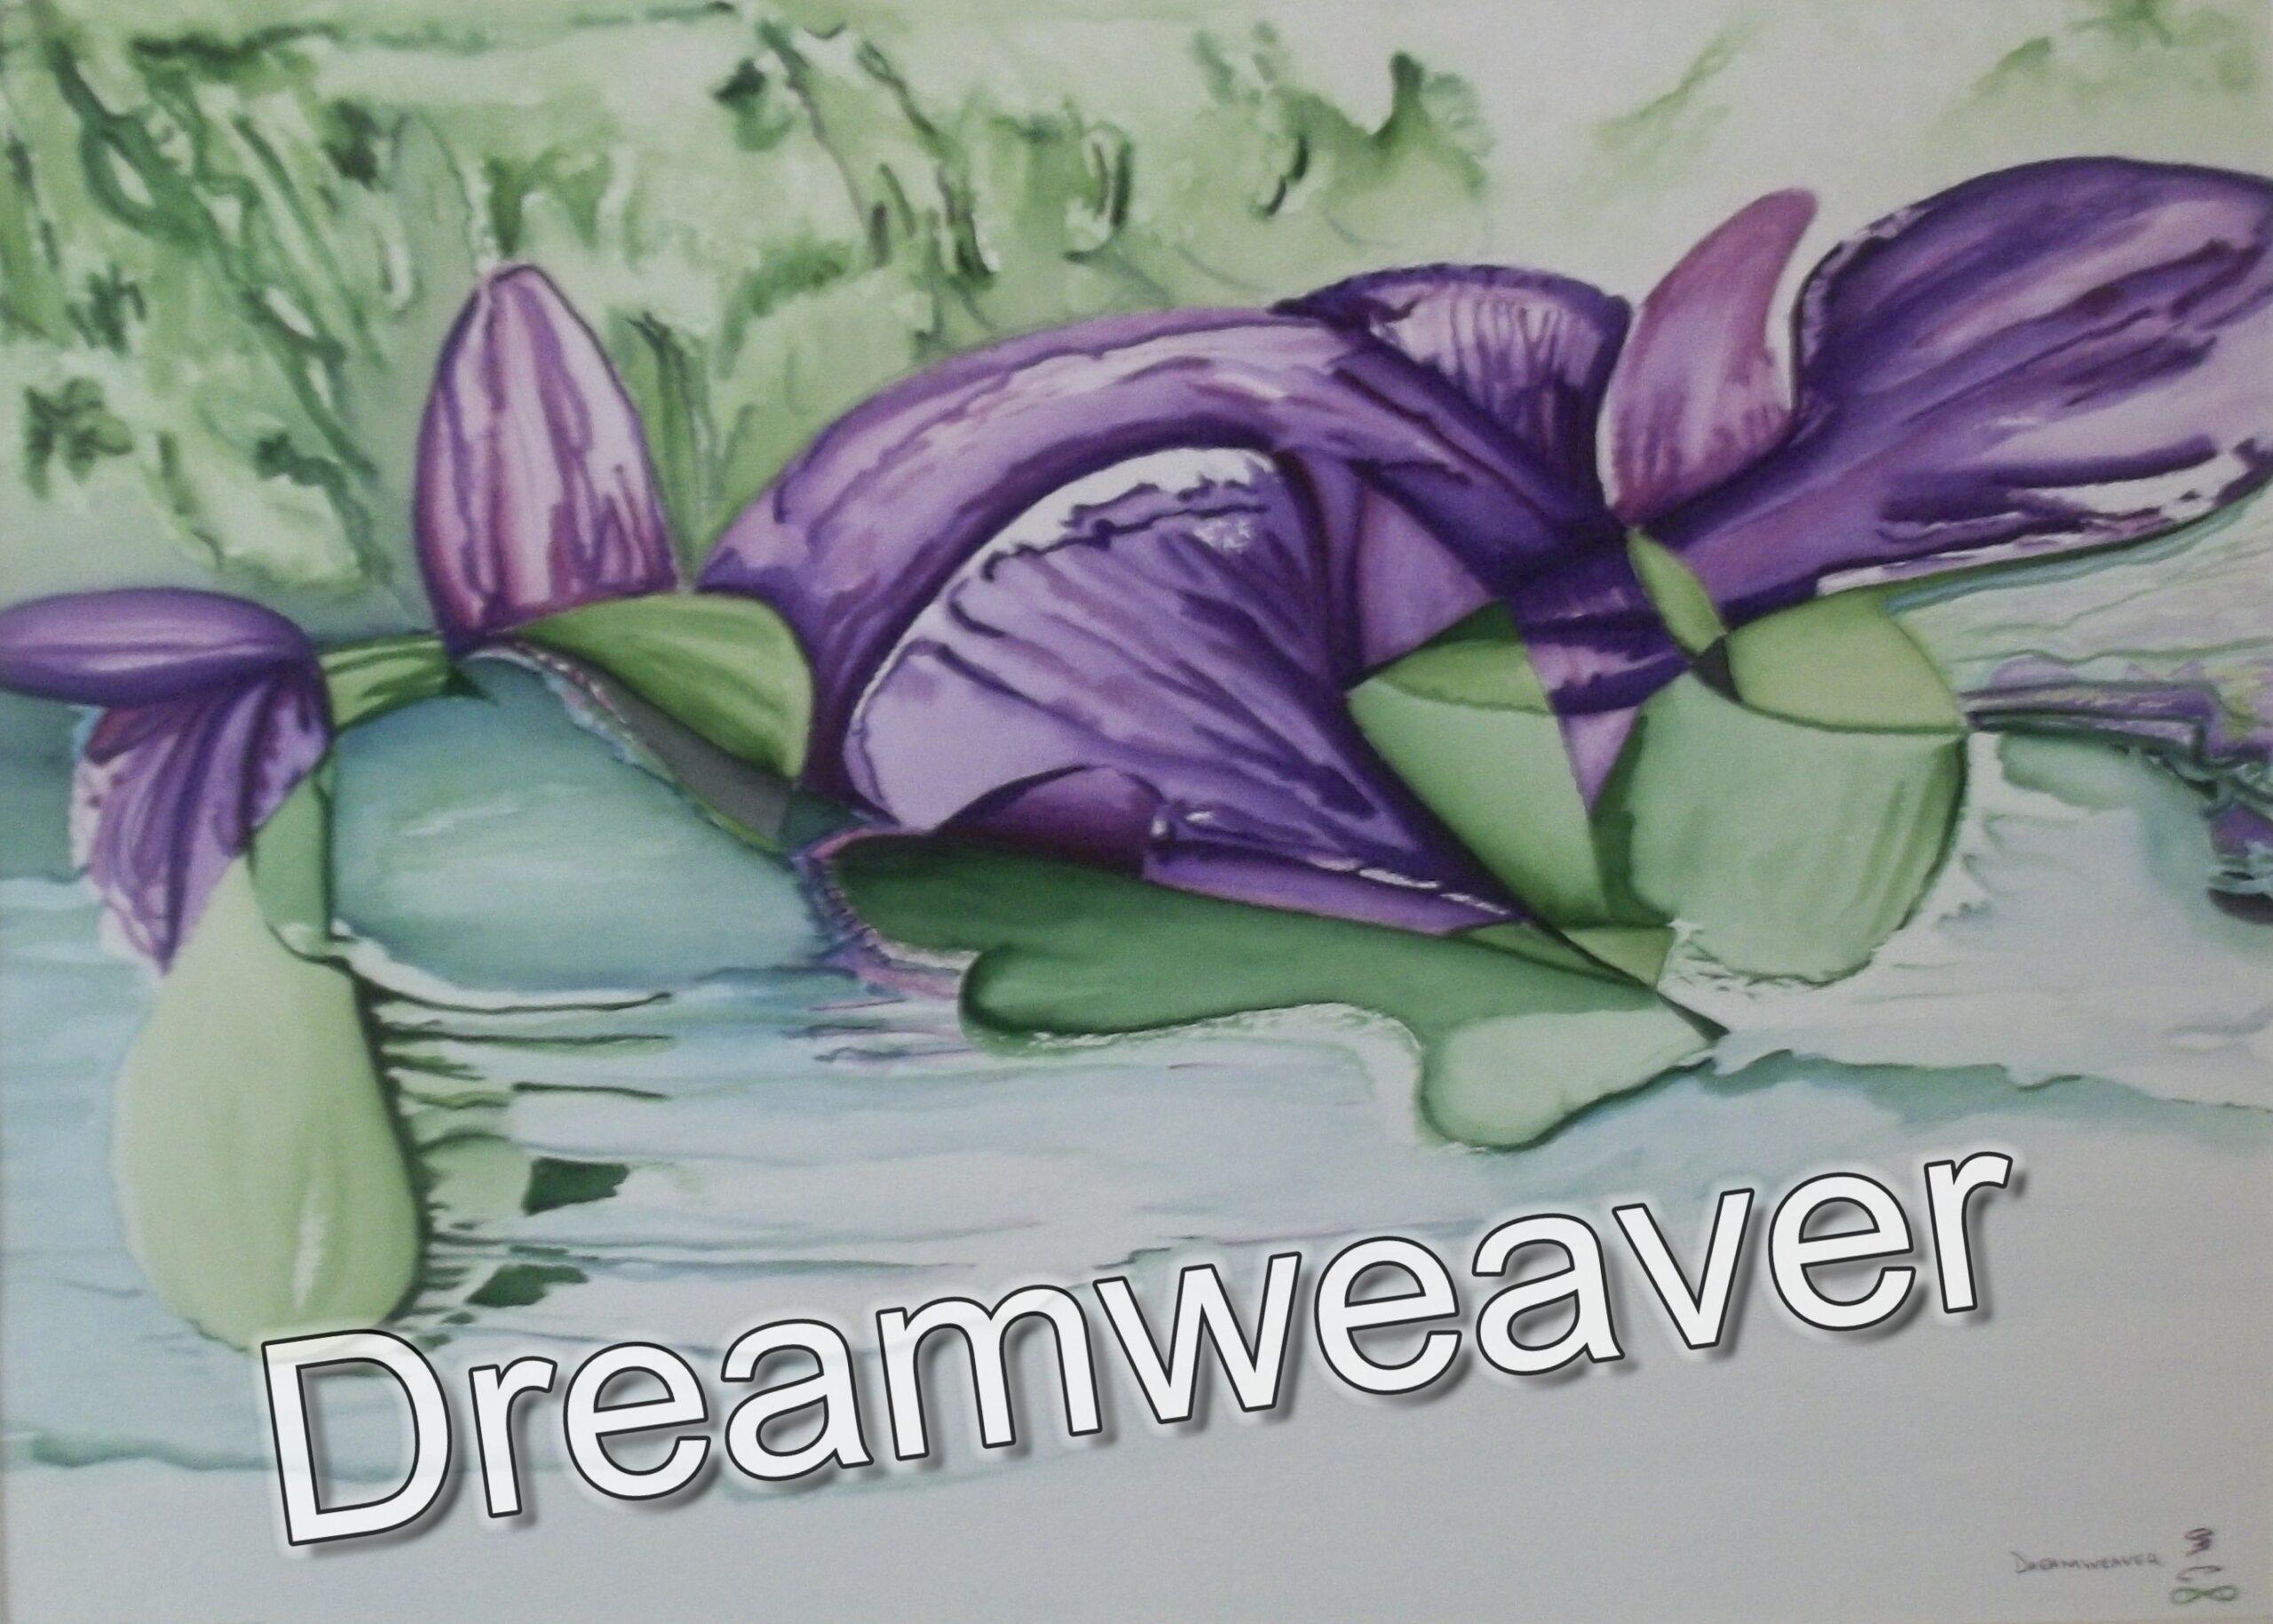 20 January 2003 by Dreamweaver